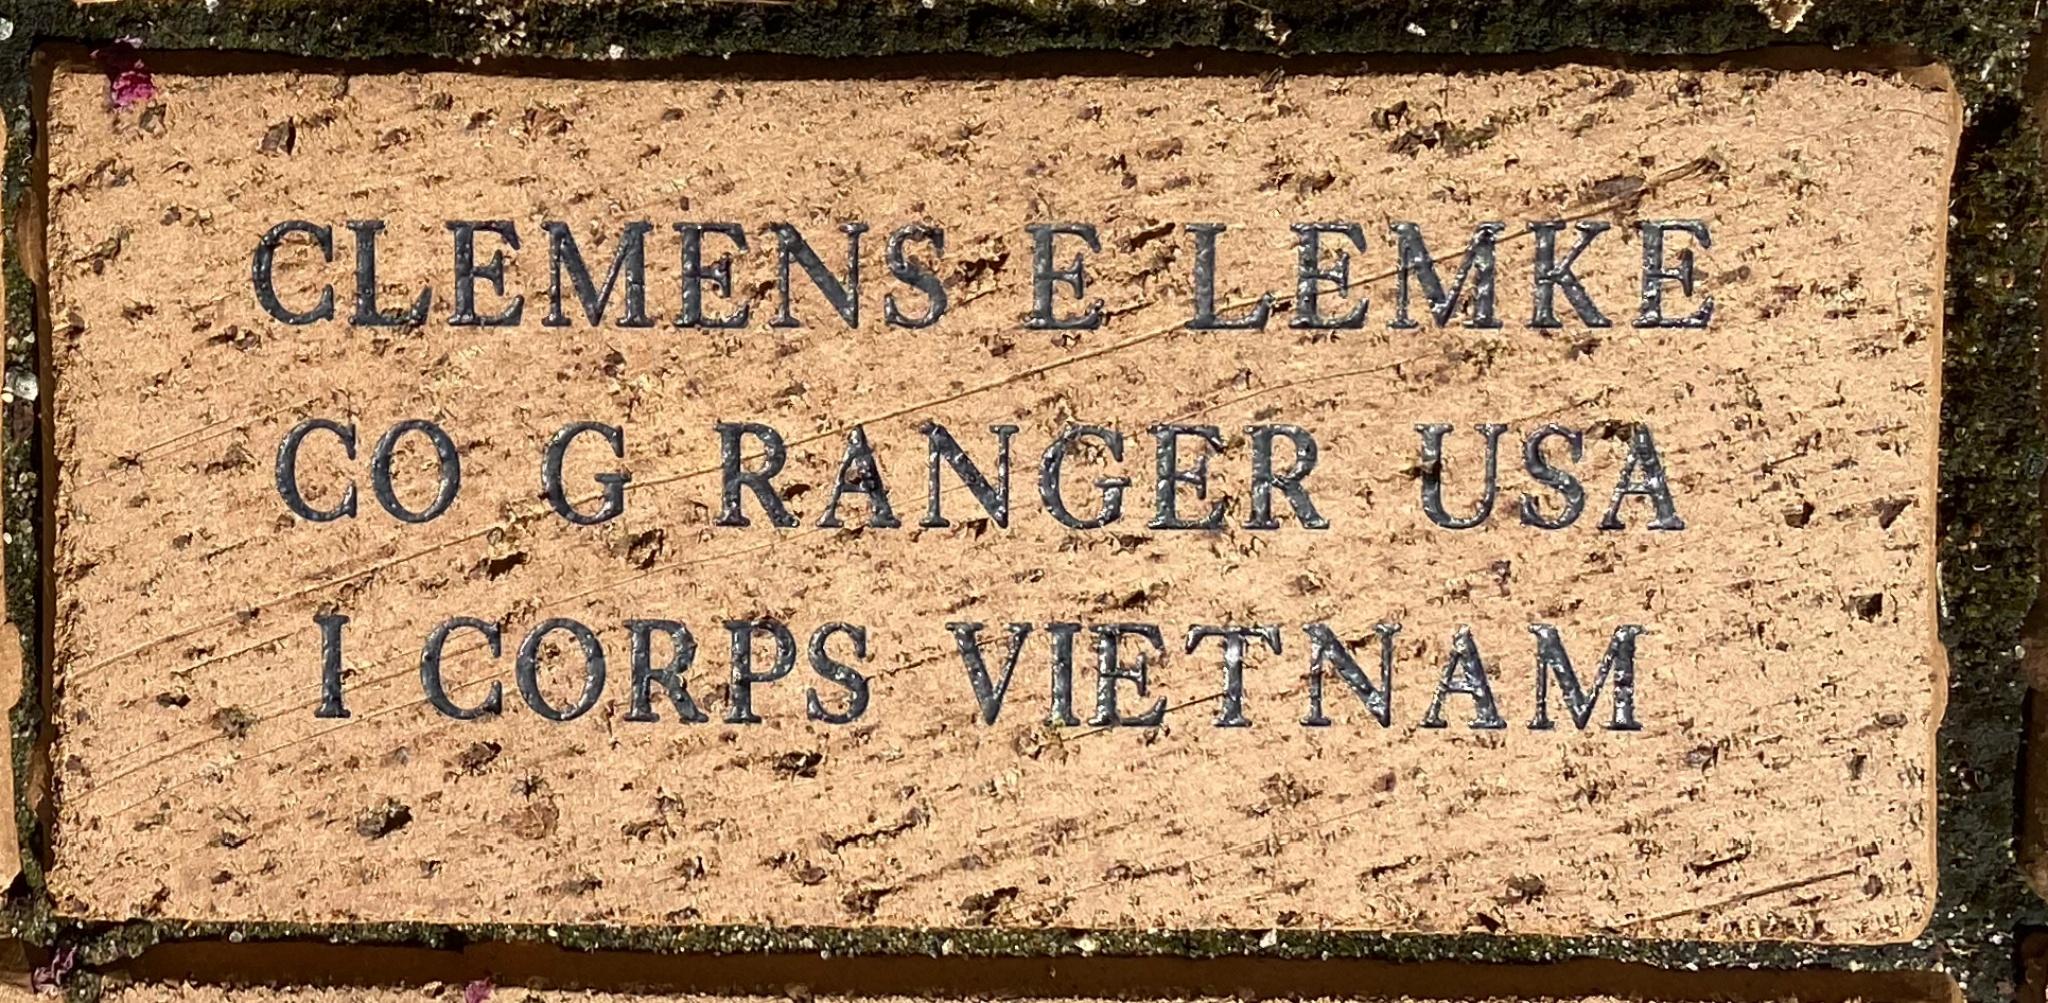 CLEMENS E LEMKE CO G RANGER USA I CORPS VIETNAM